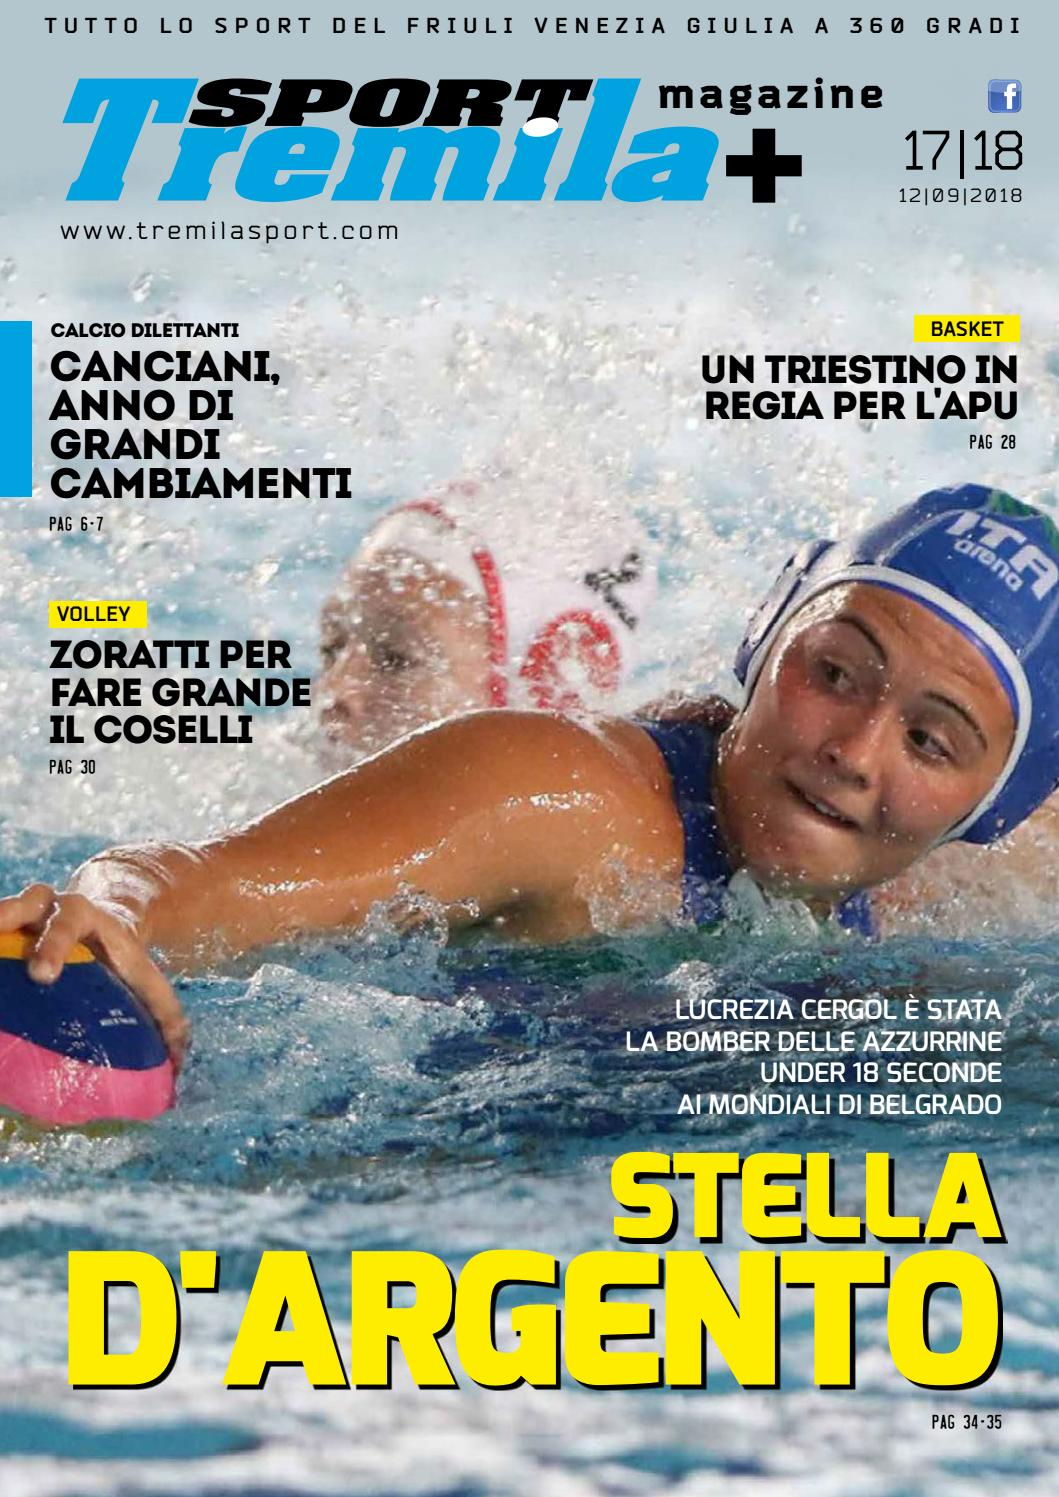 n° 17 TremilaSport 12-09-2018 by Tremilasport - issuu 9c4aec2345c2